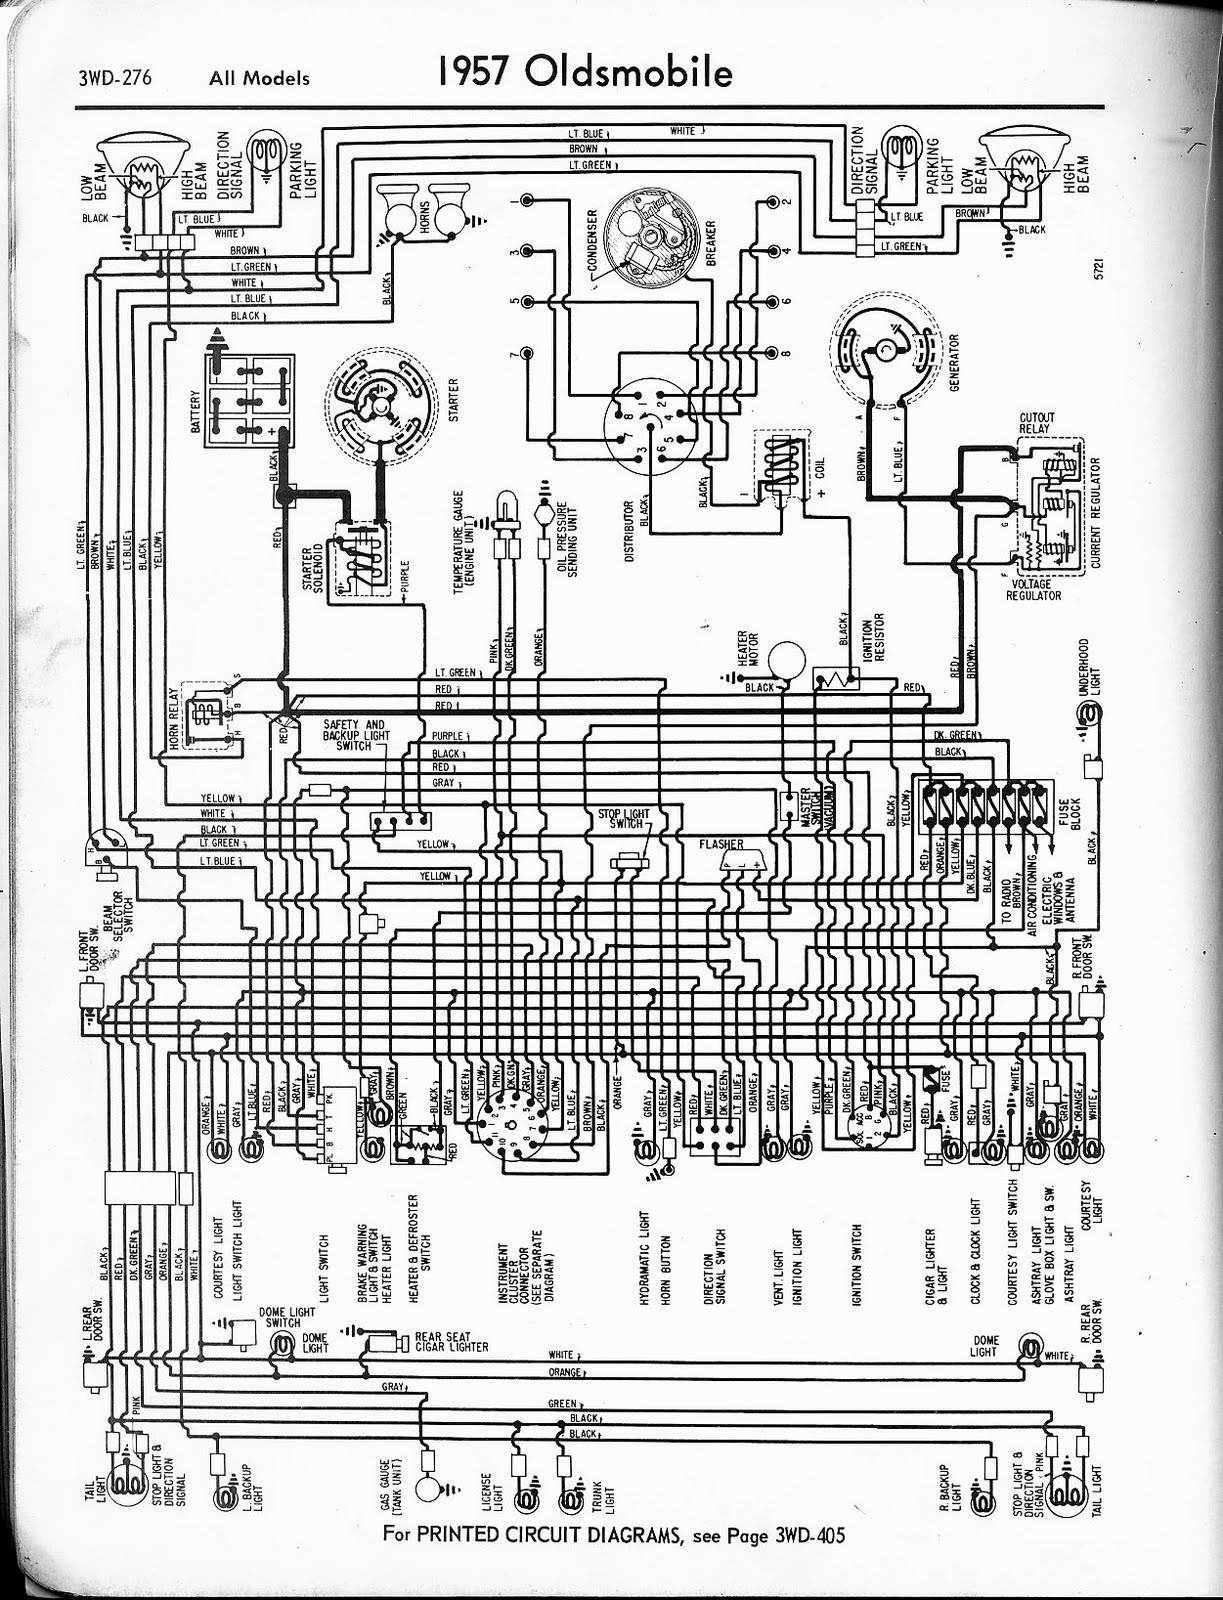 free auto wiring diagram 1957 oldsmobile wiring diagram fiat stilo wiring diagram engine [ 1223 x 1600 Pixel ]